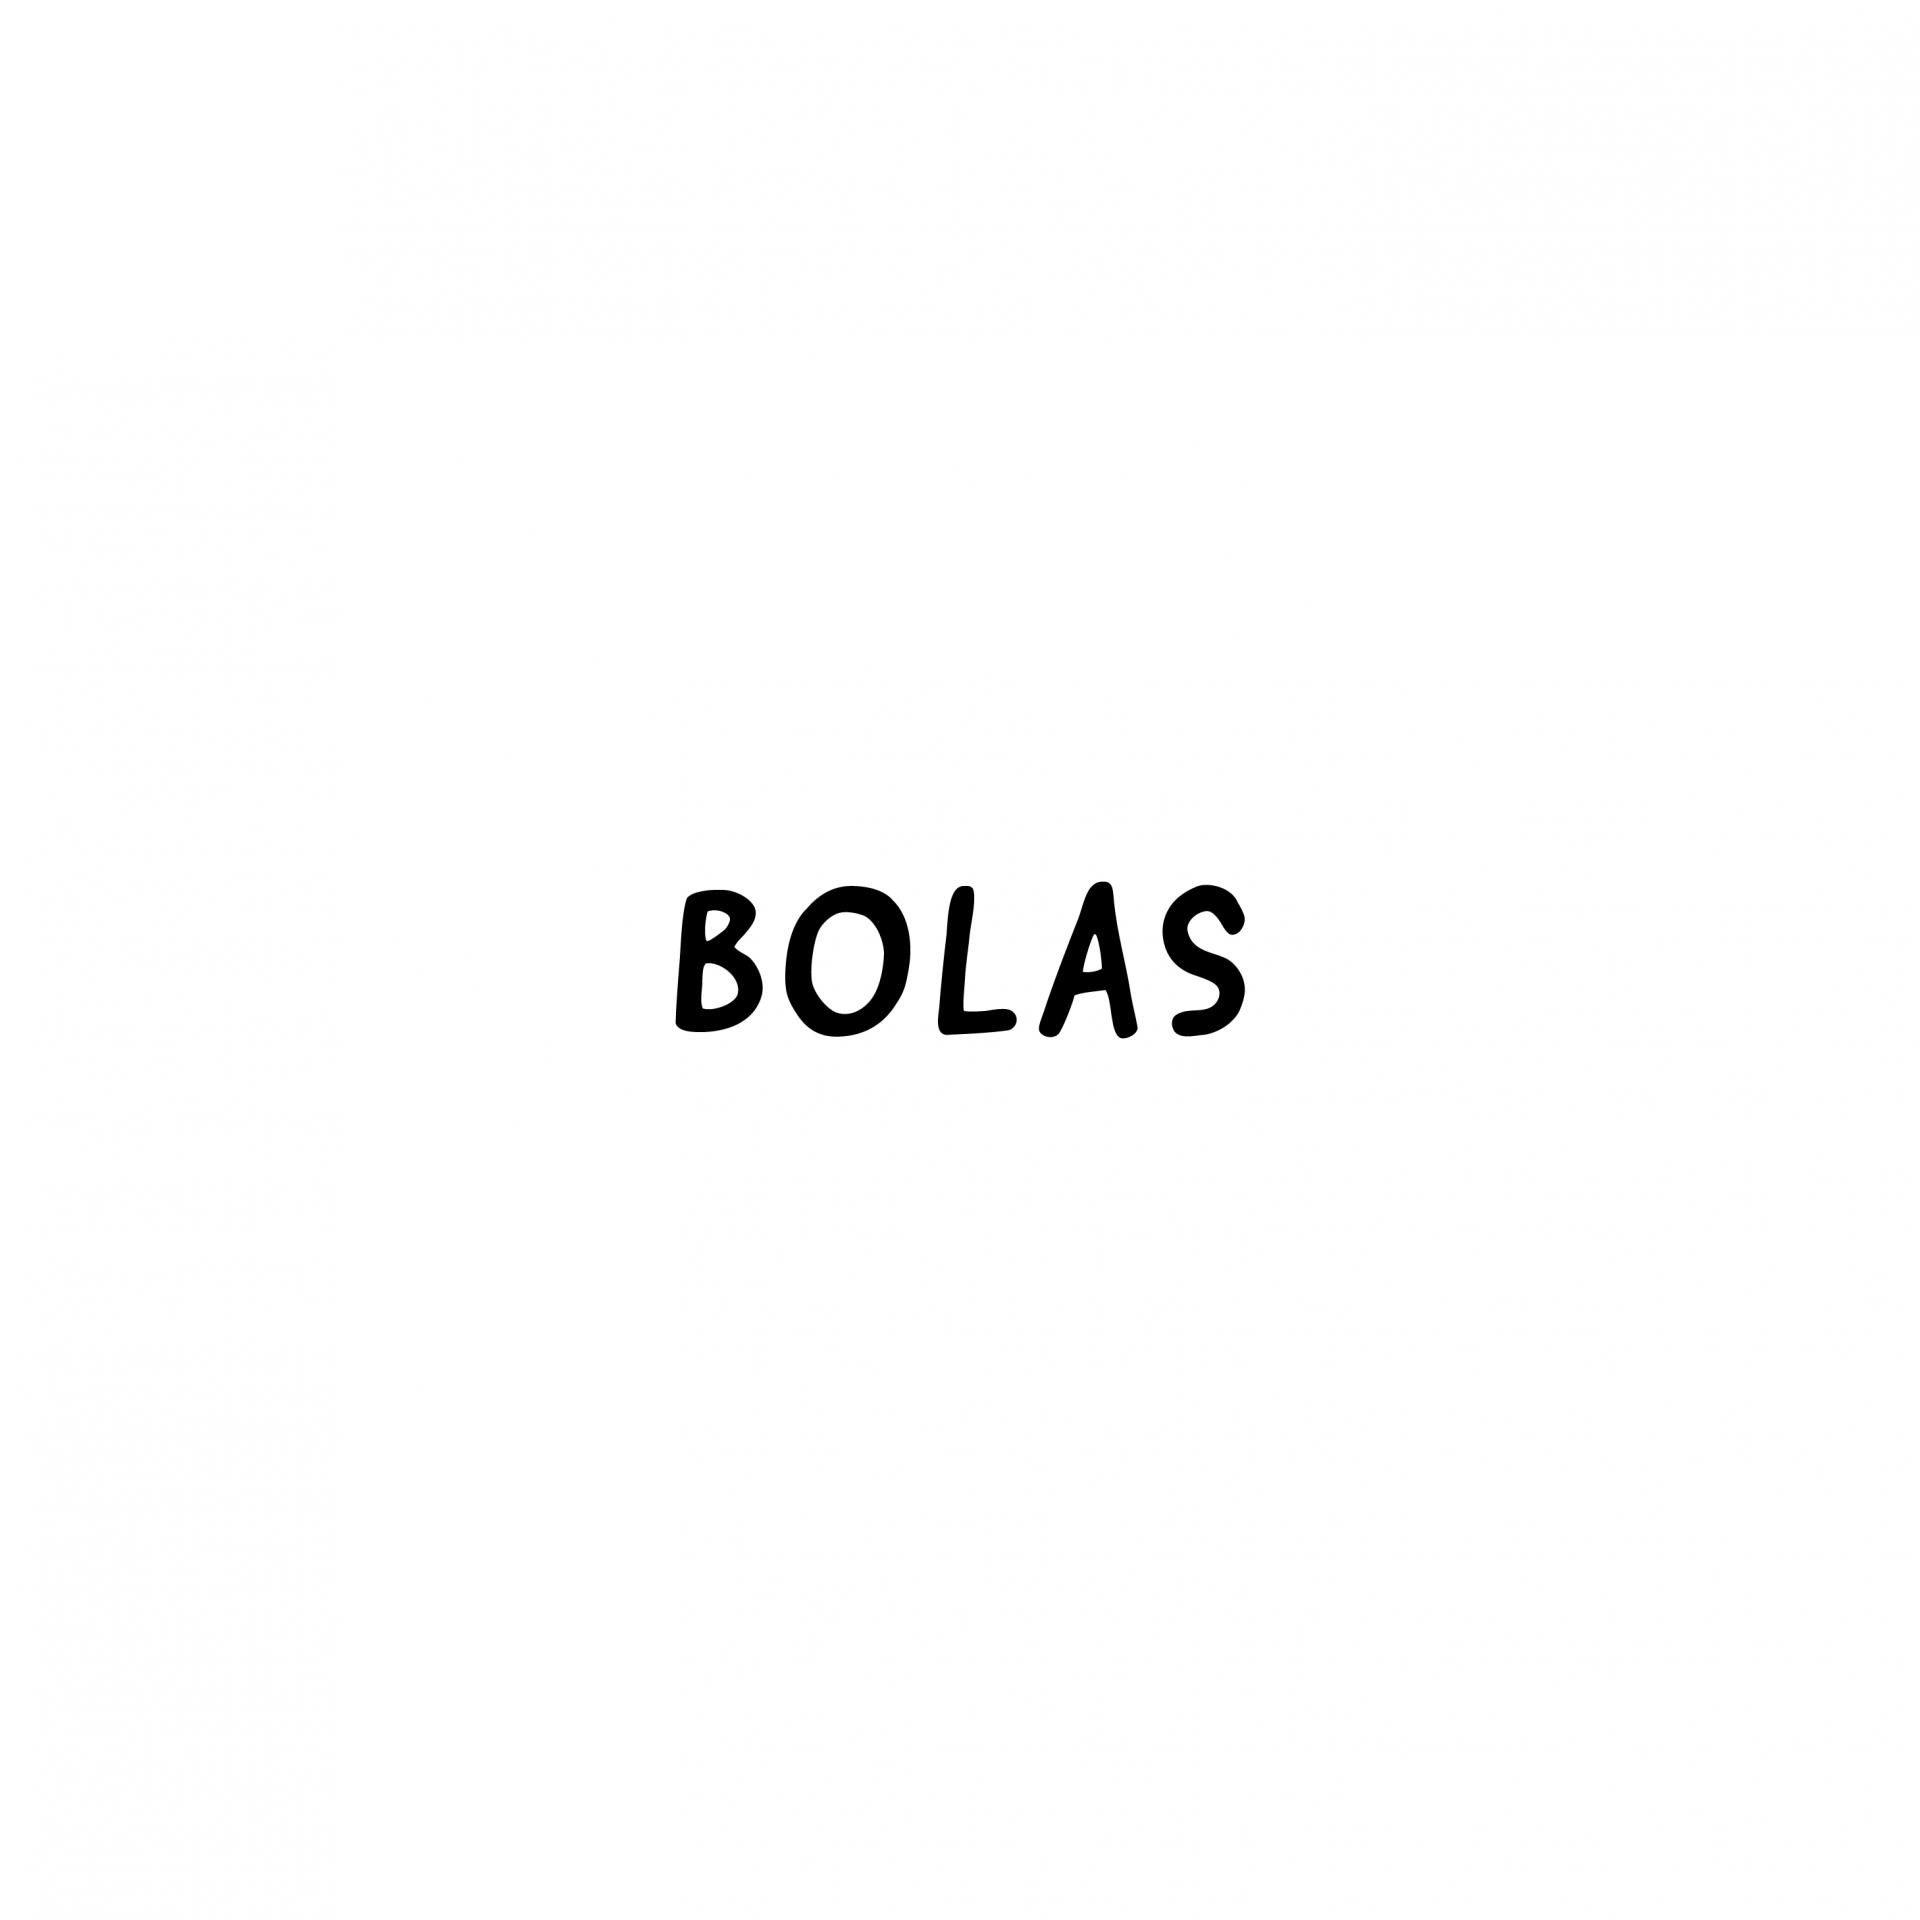 Bolas 03